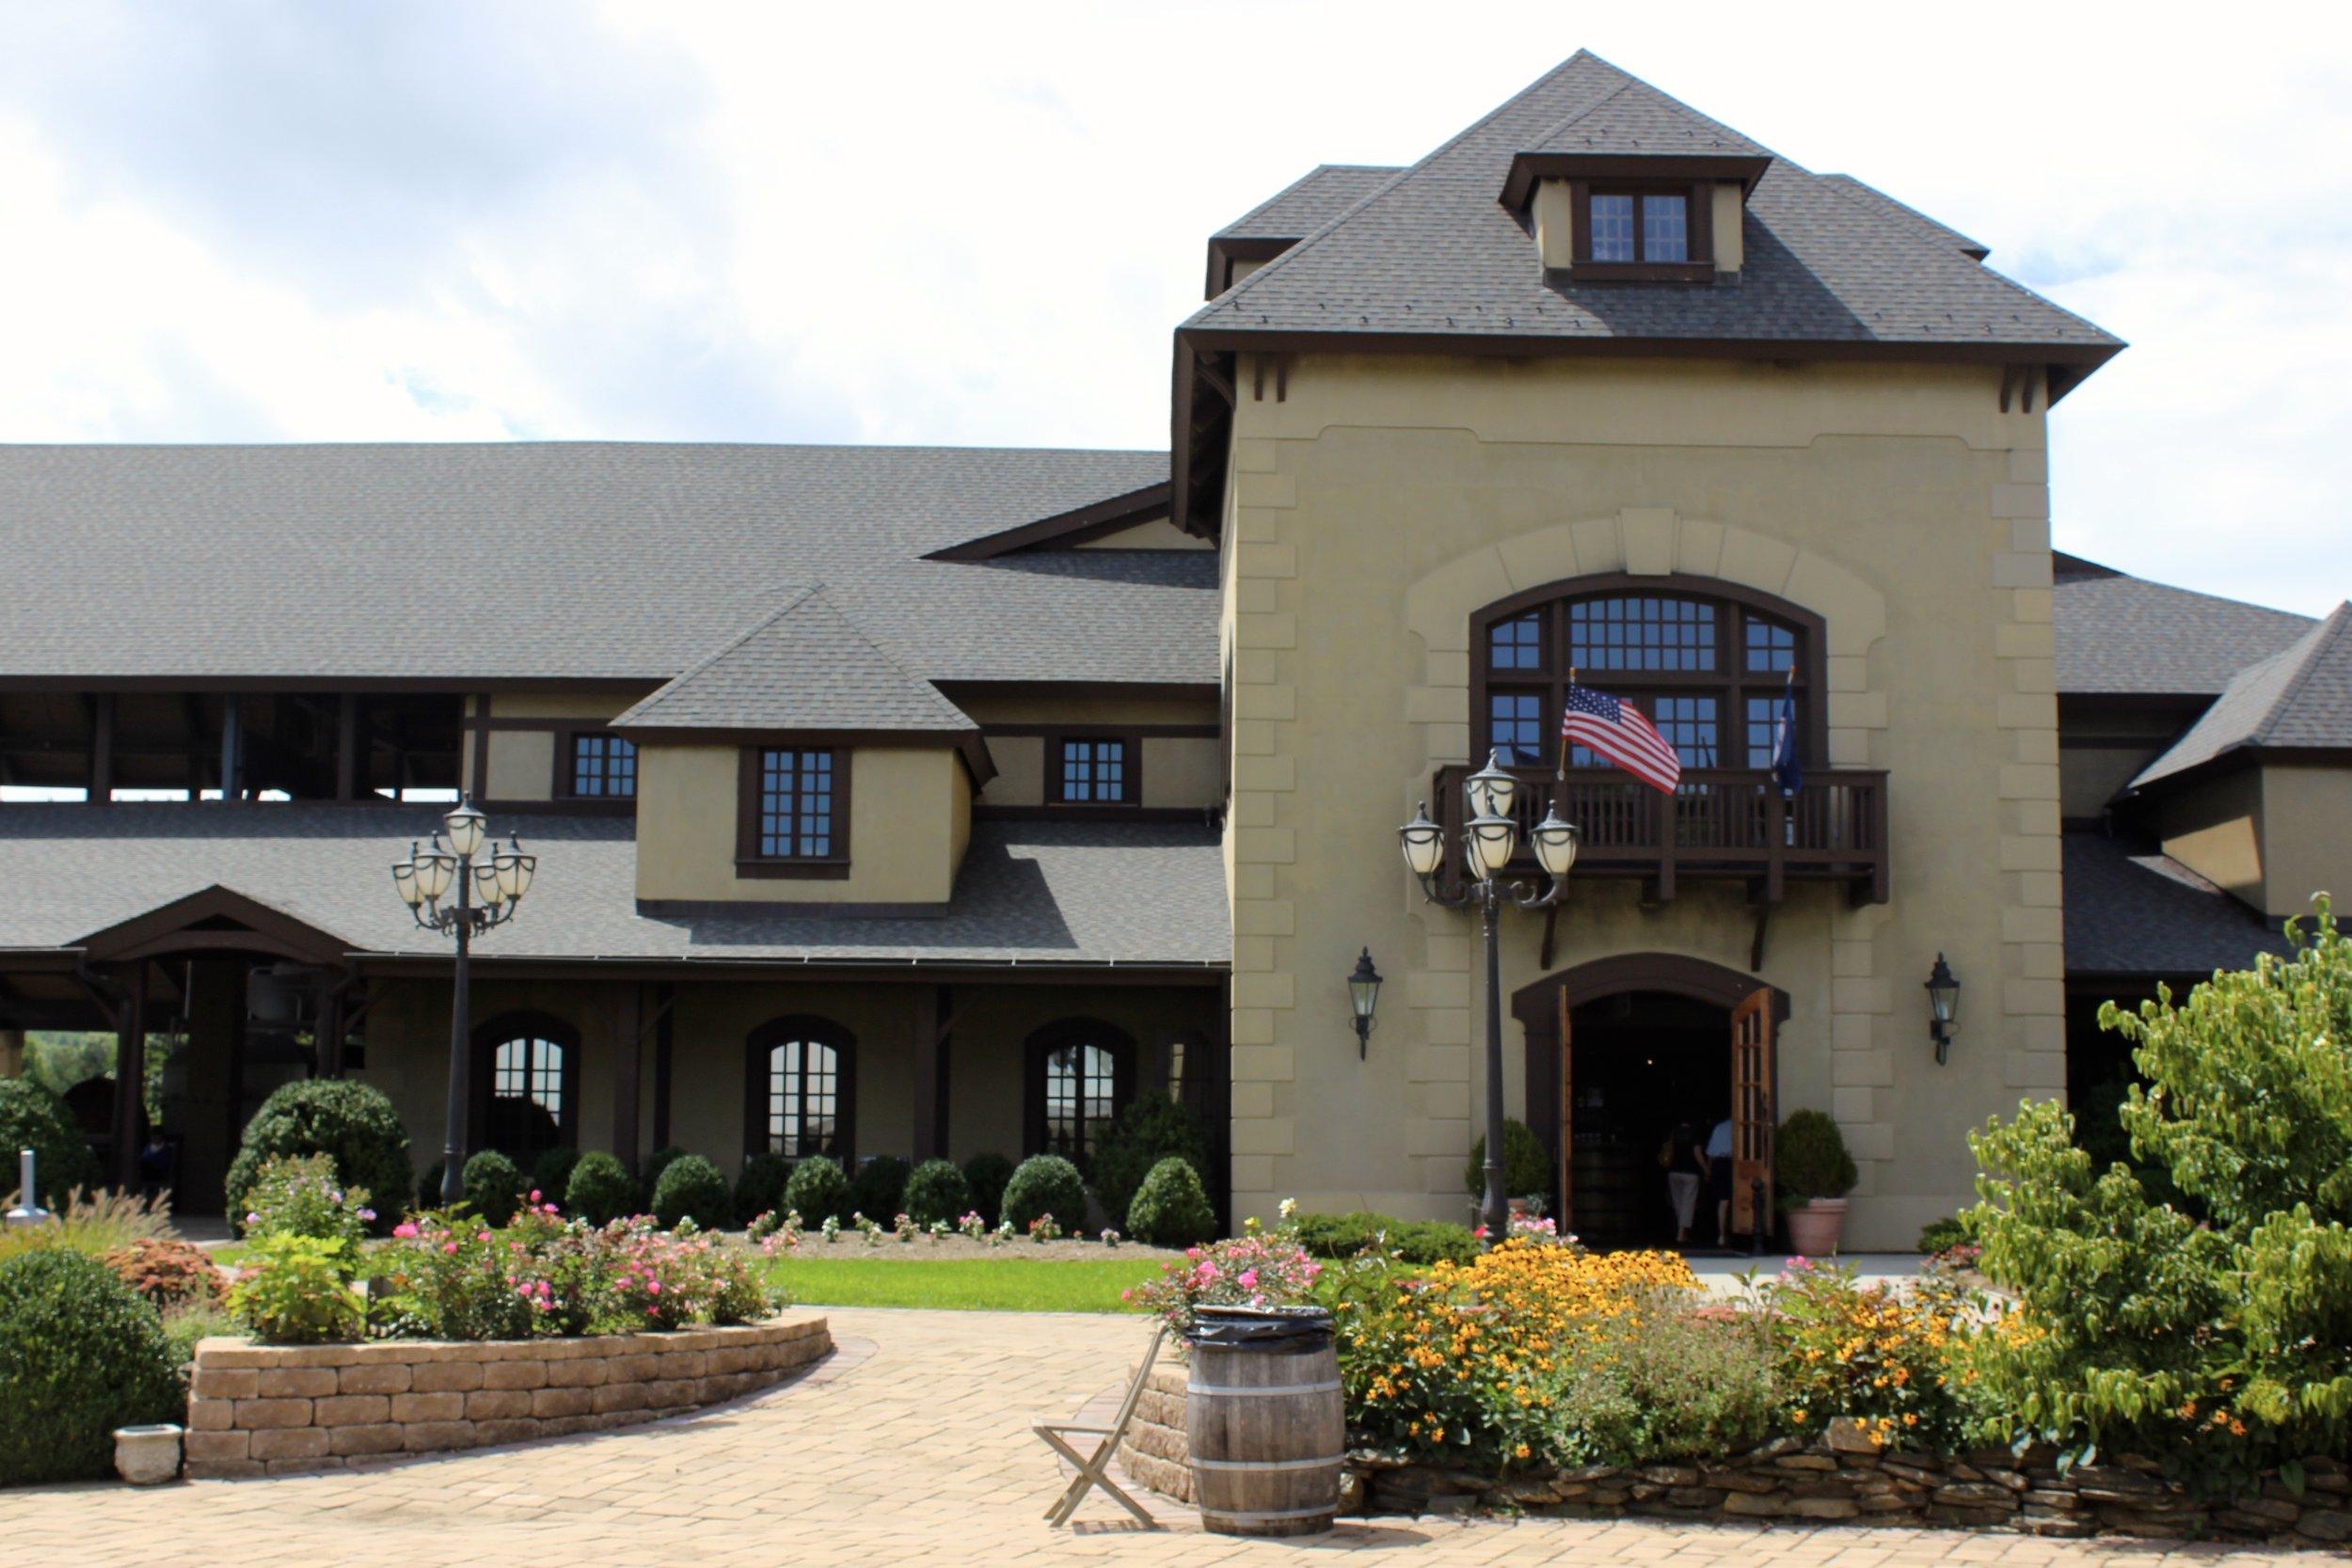 Chateau Morrisette Winery